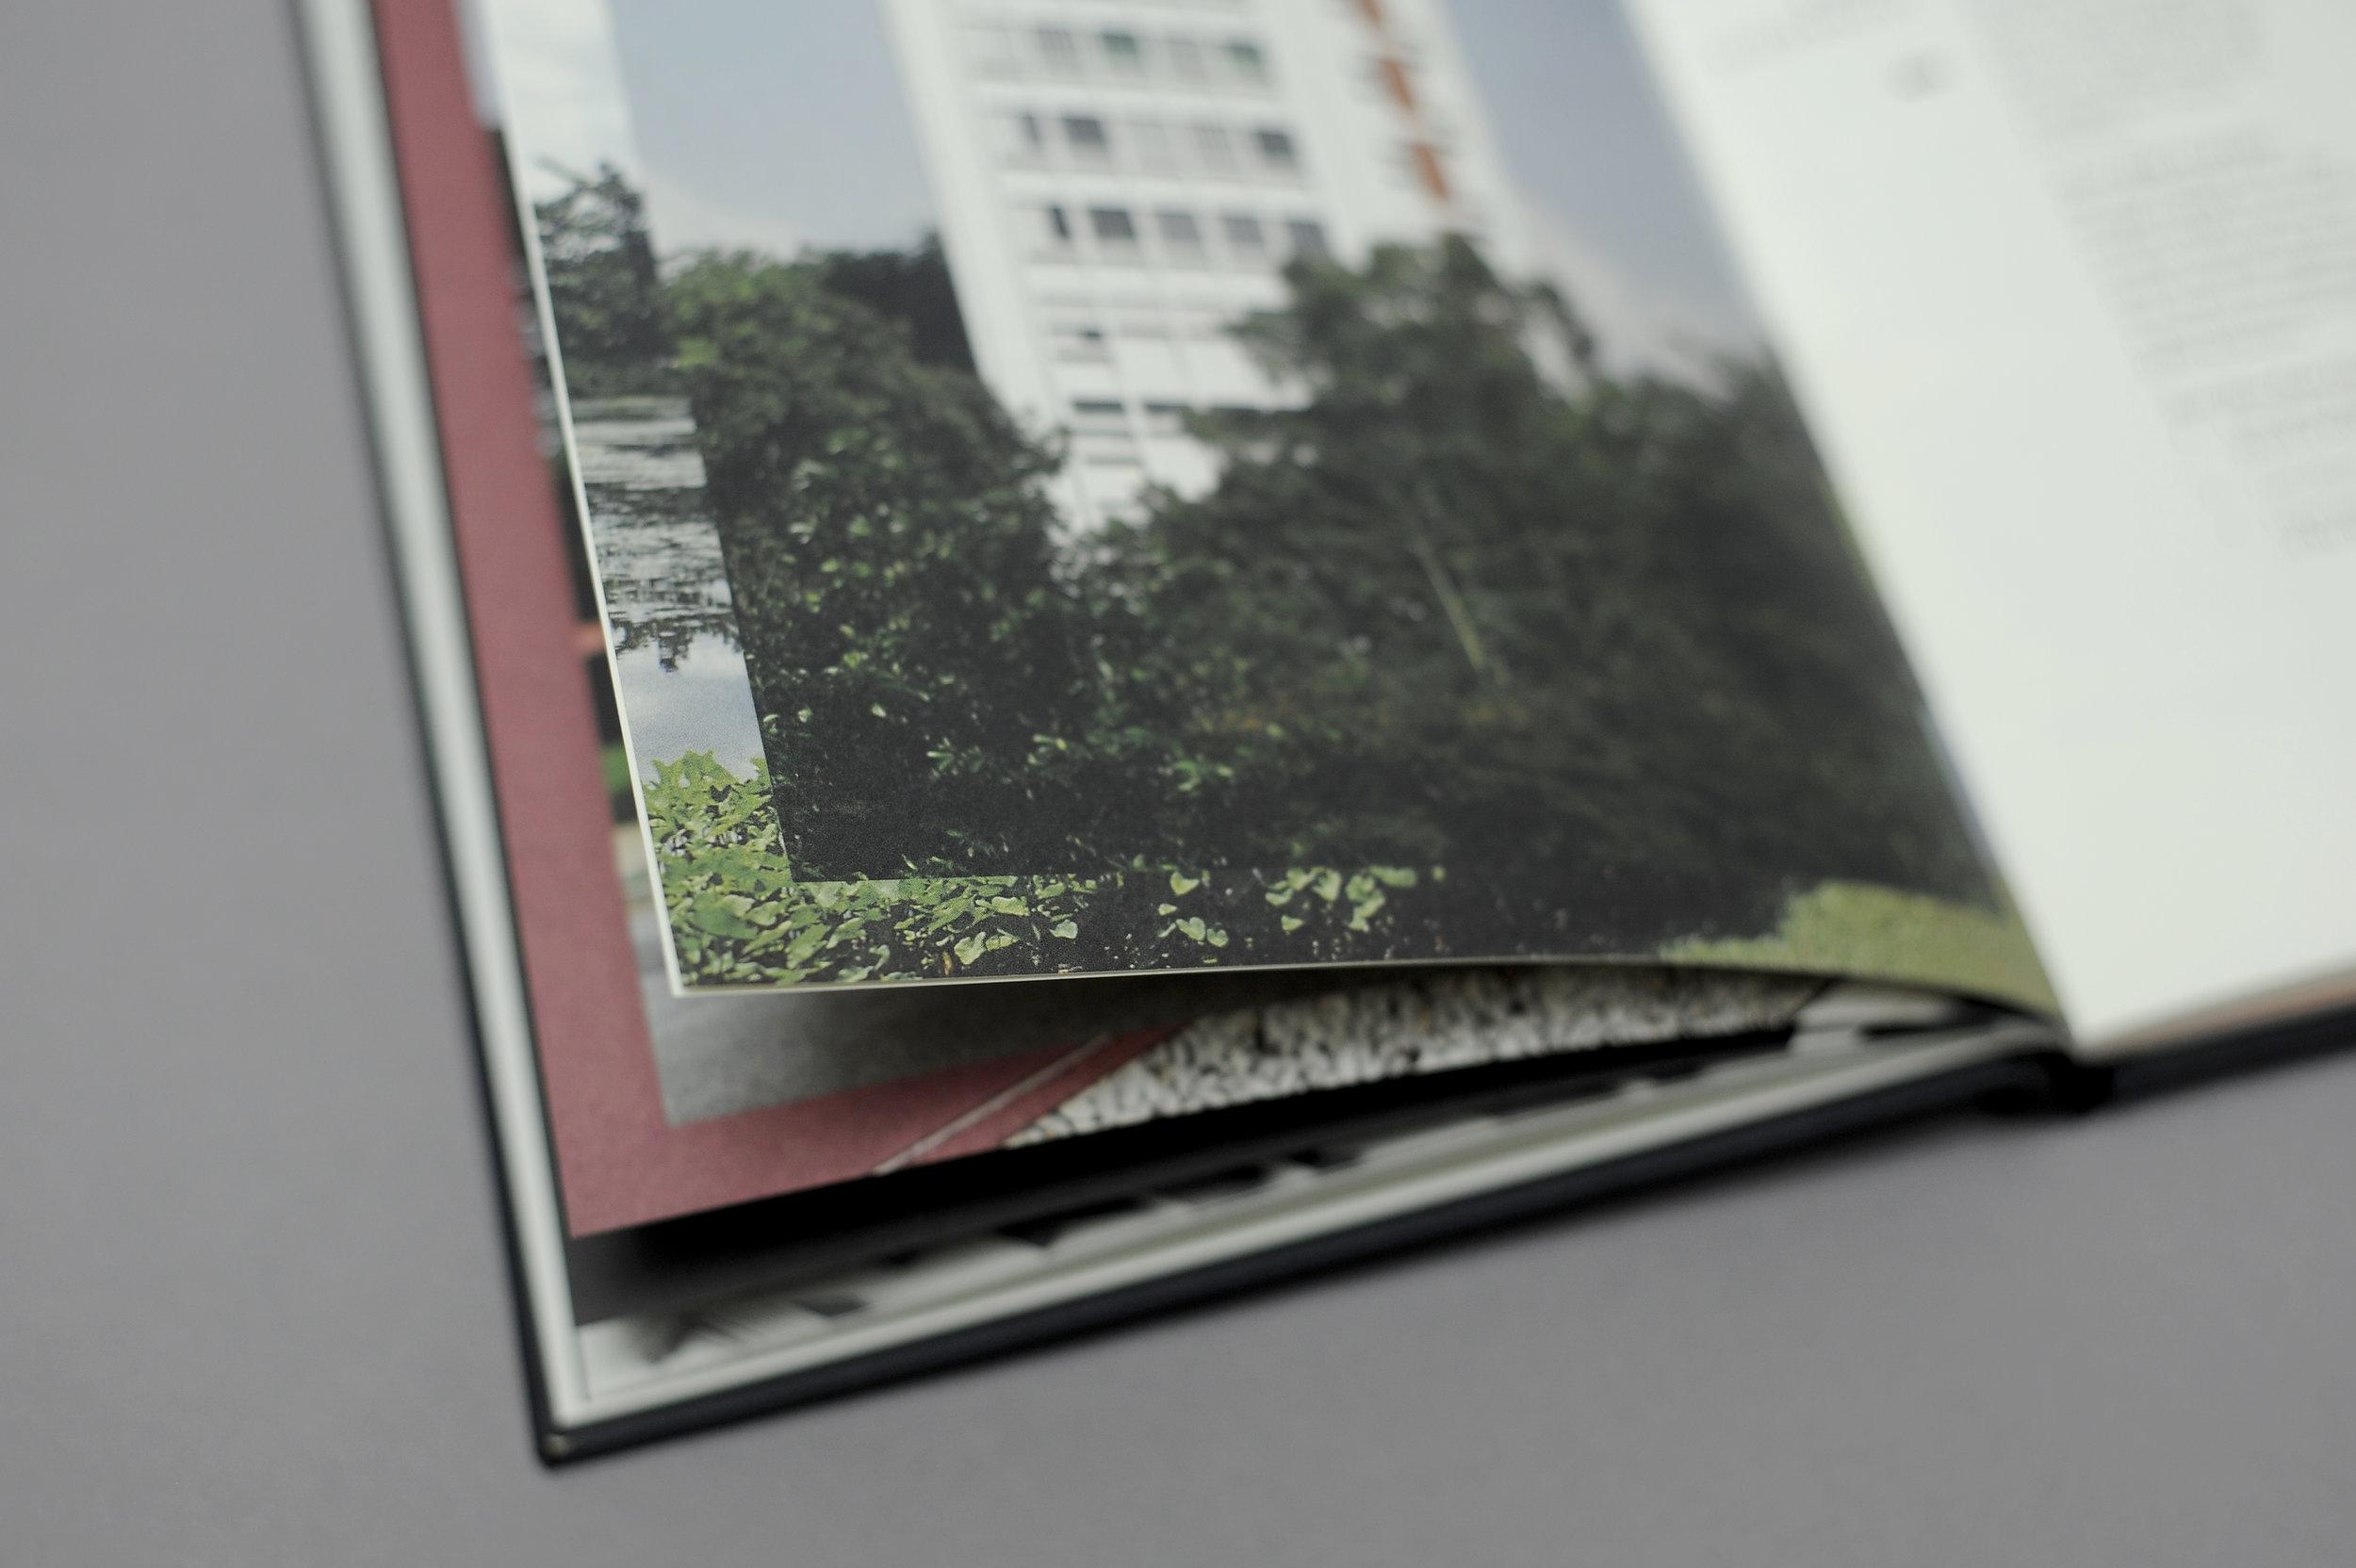 lee kuan yew school of public policy yearbook 13.jpg